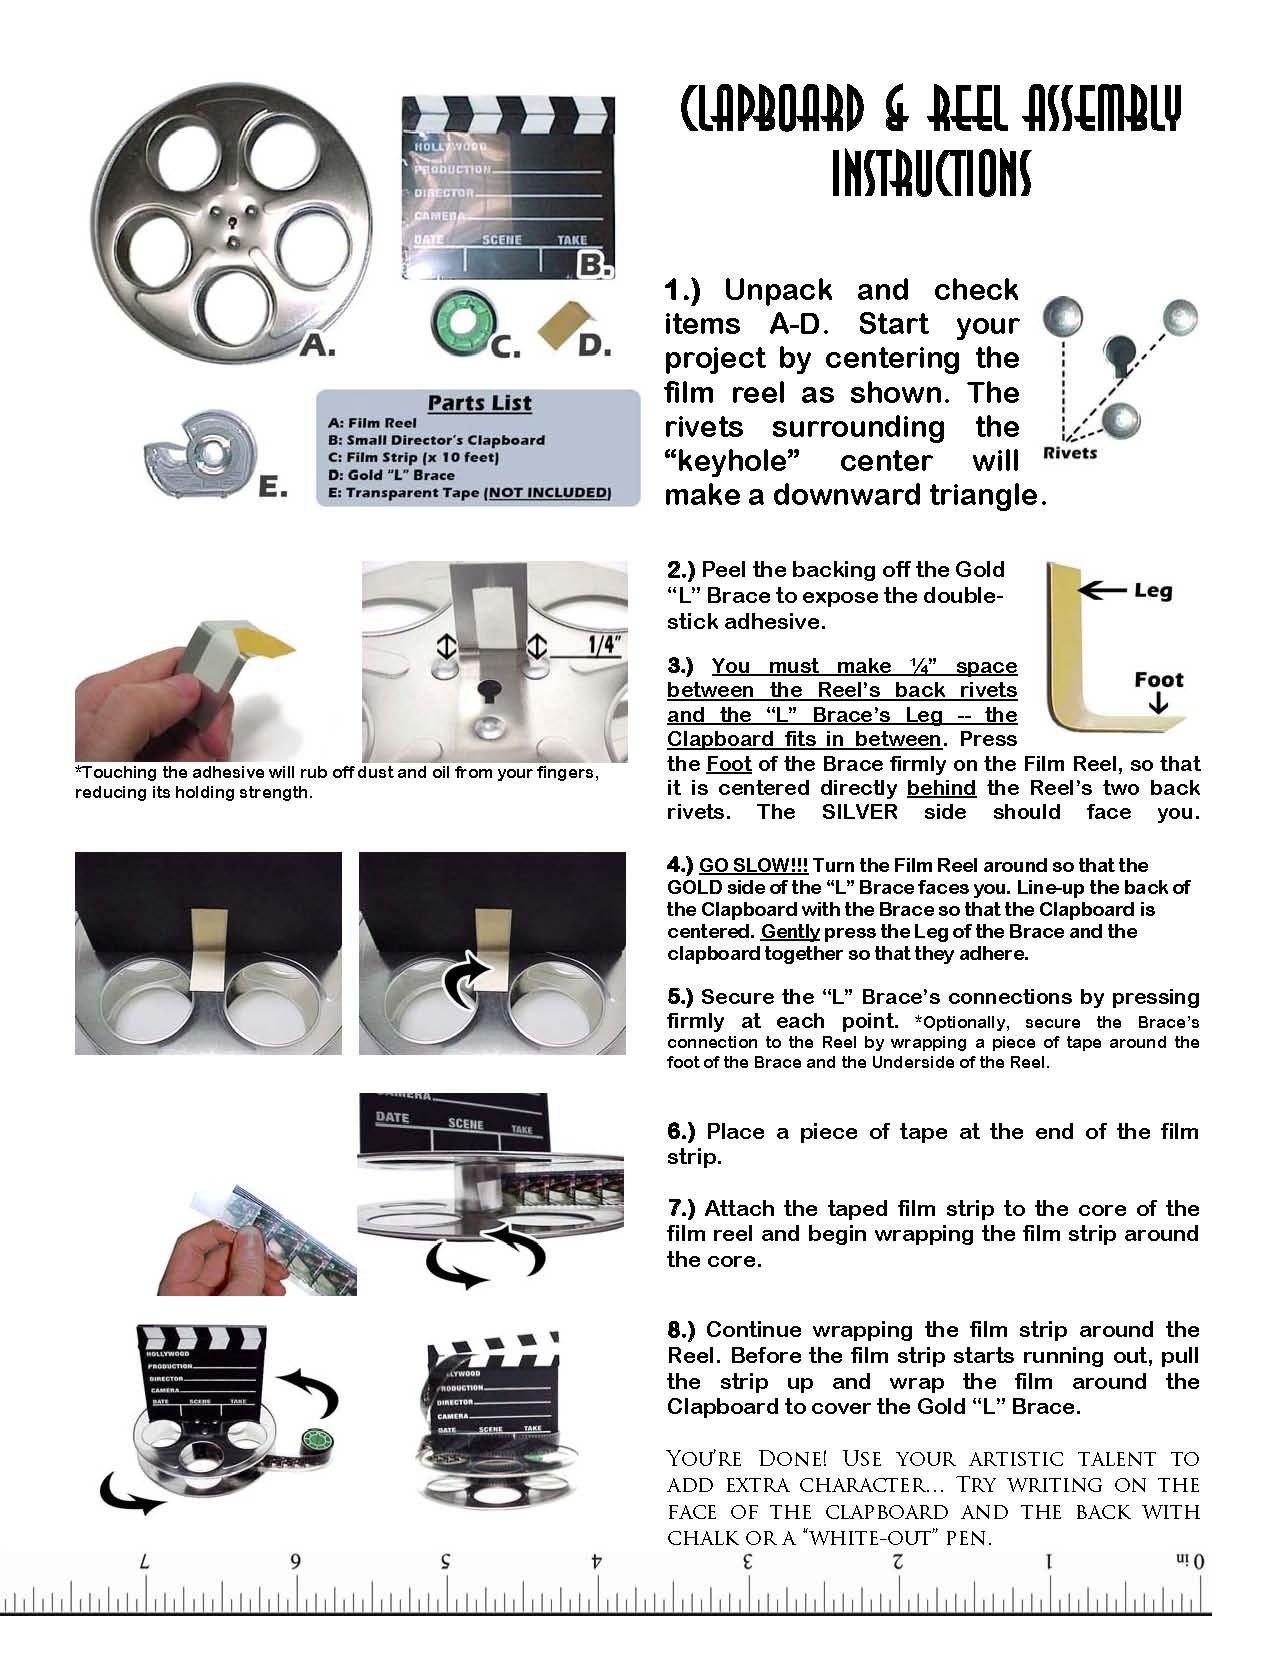 Hollywood Studio Clapboard & Reel Centerpiece - Silver